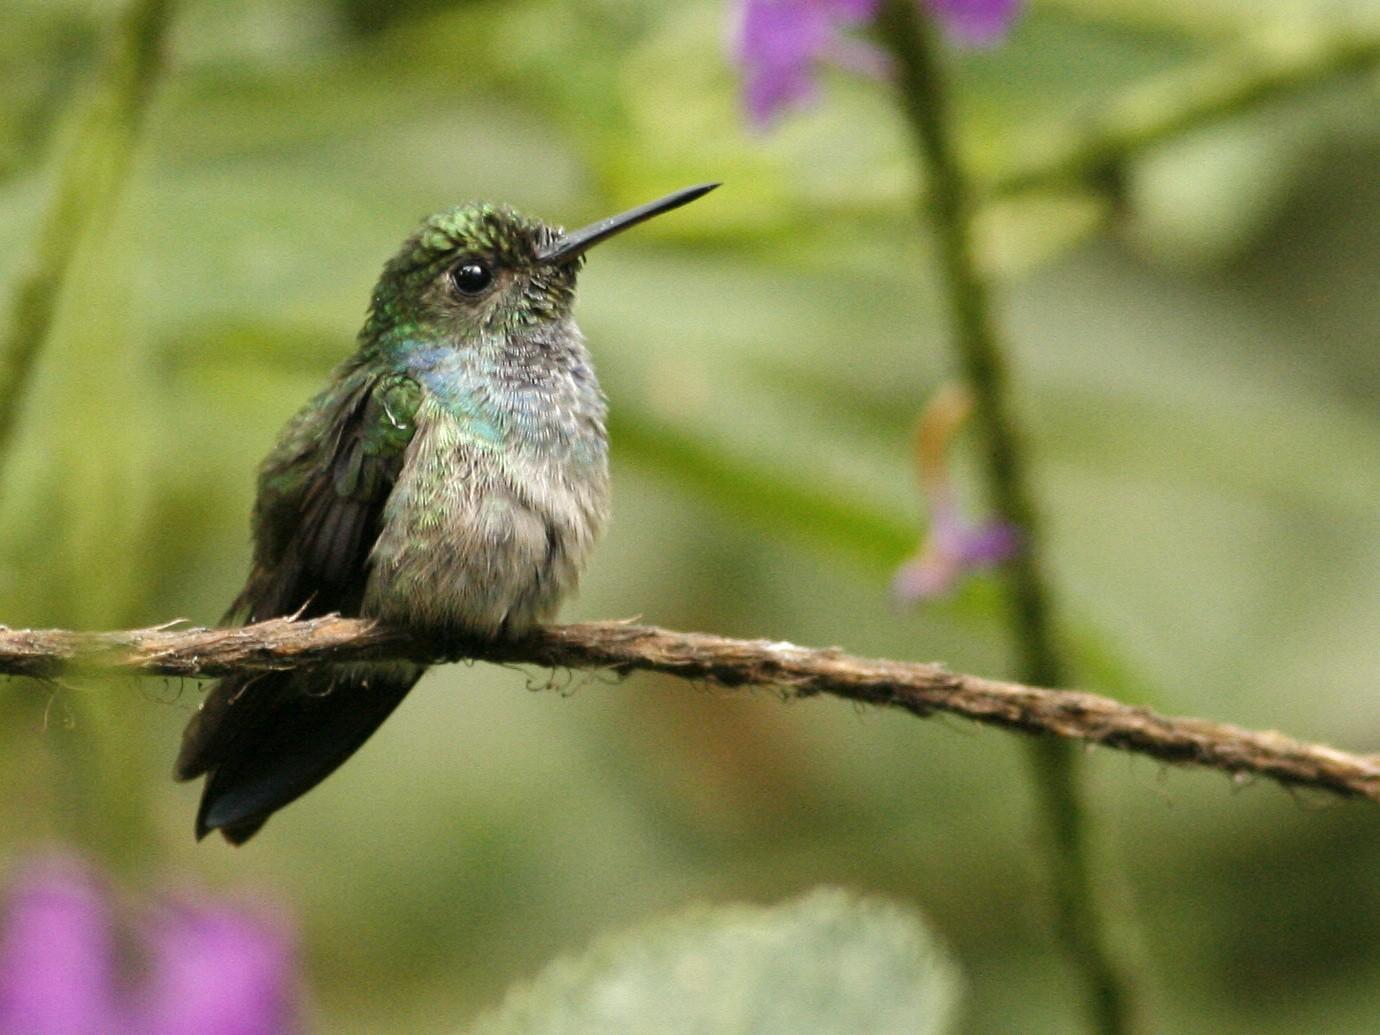 Blue-chested Hummingbird - Luke Seitz